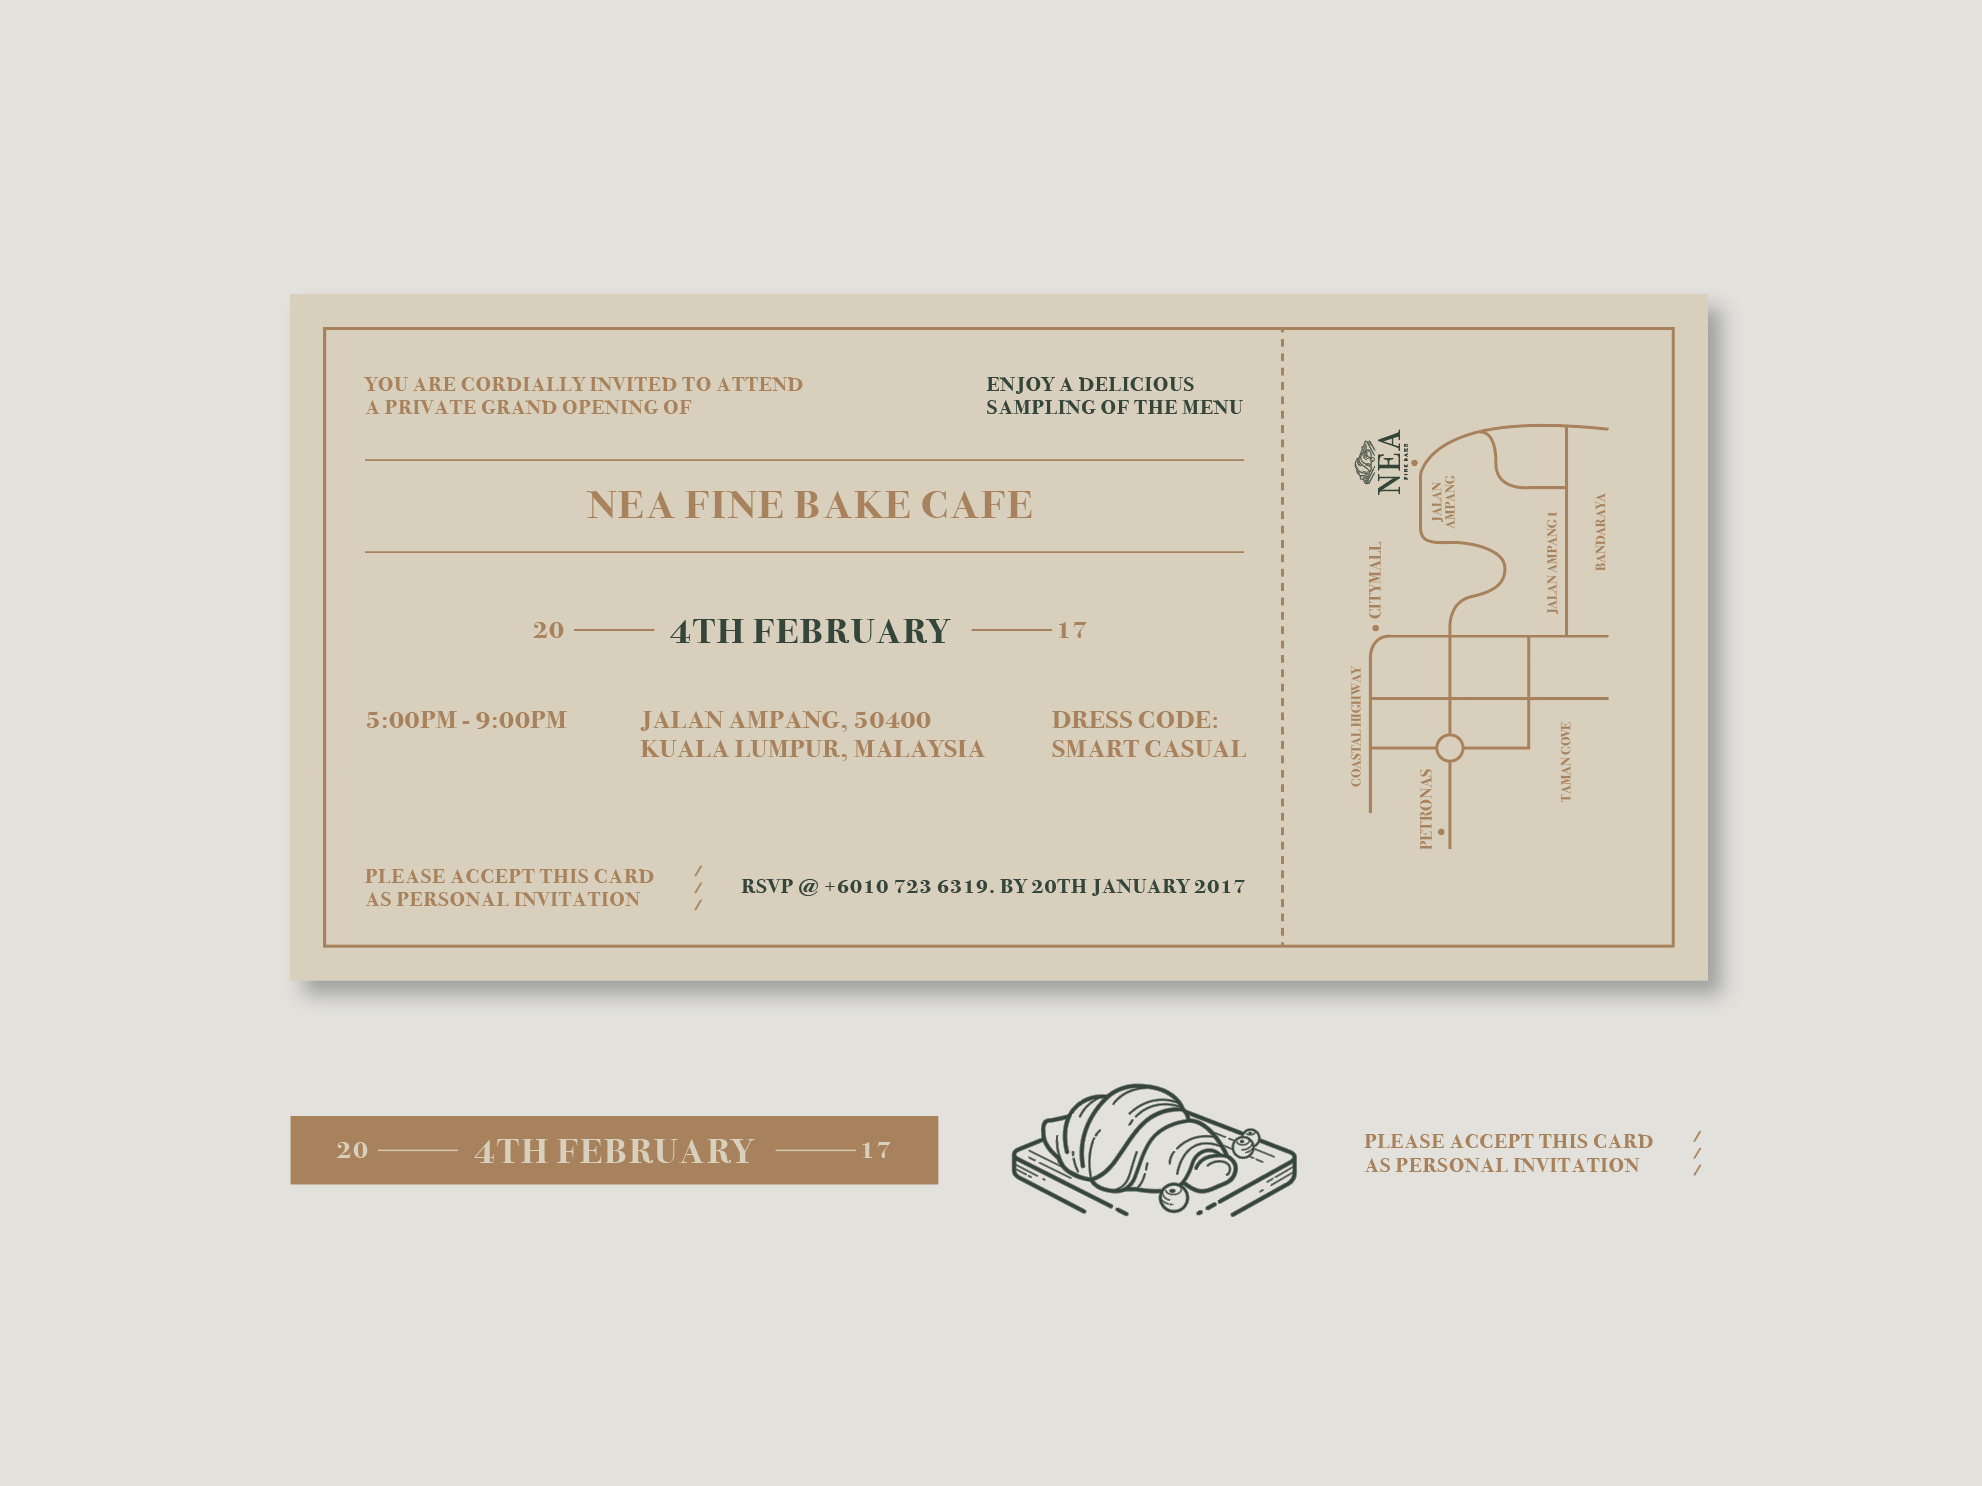 Nea fine bake cafe invitation card